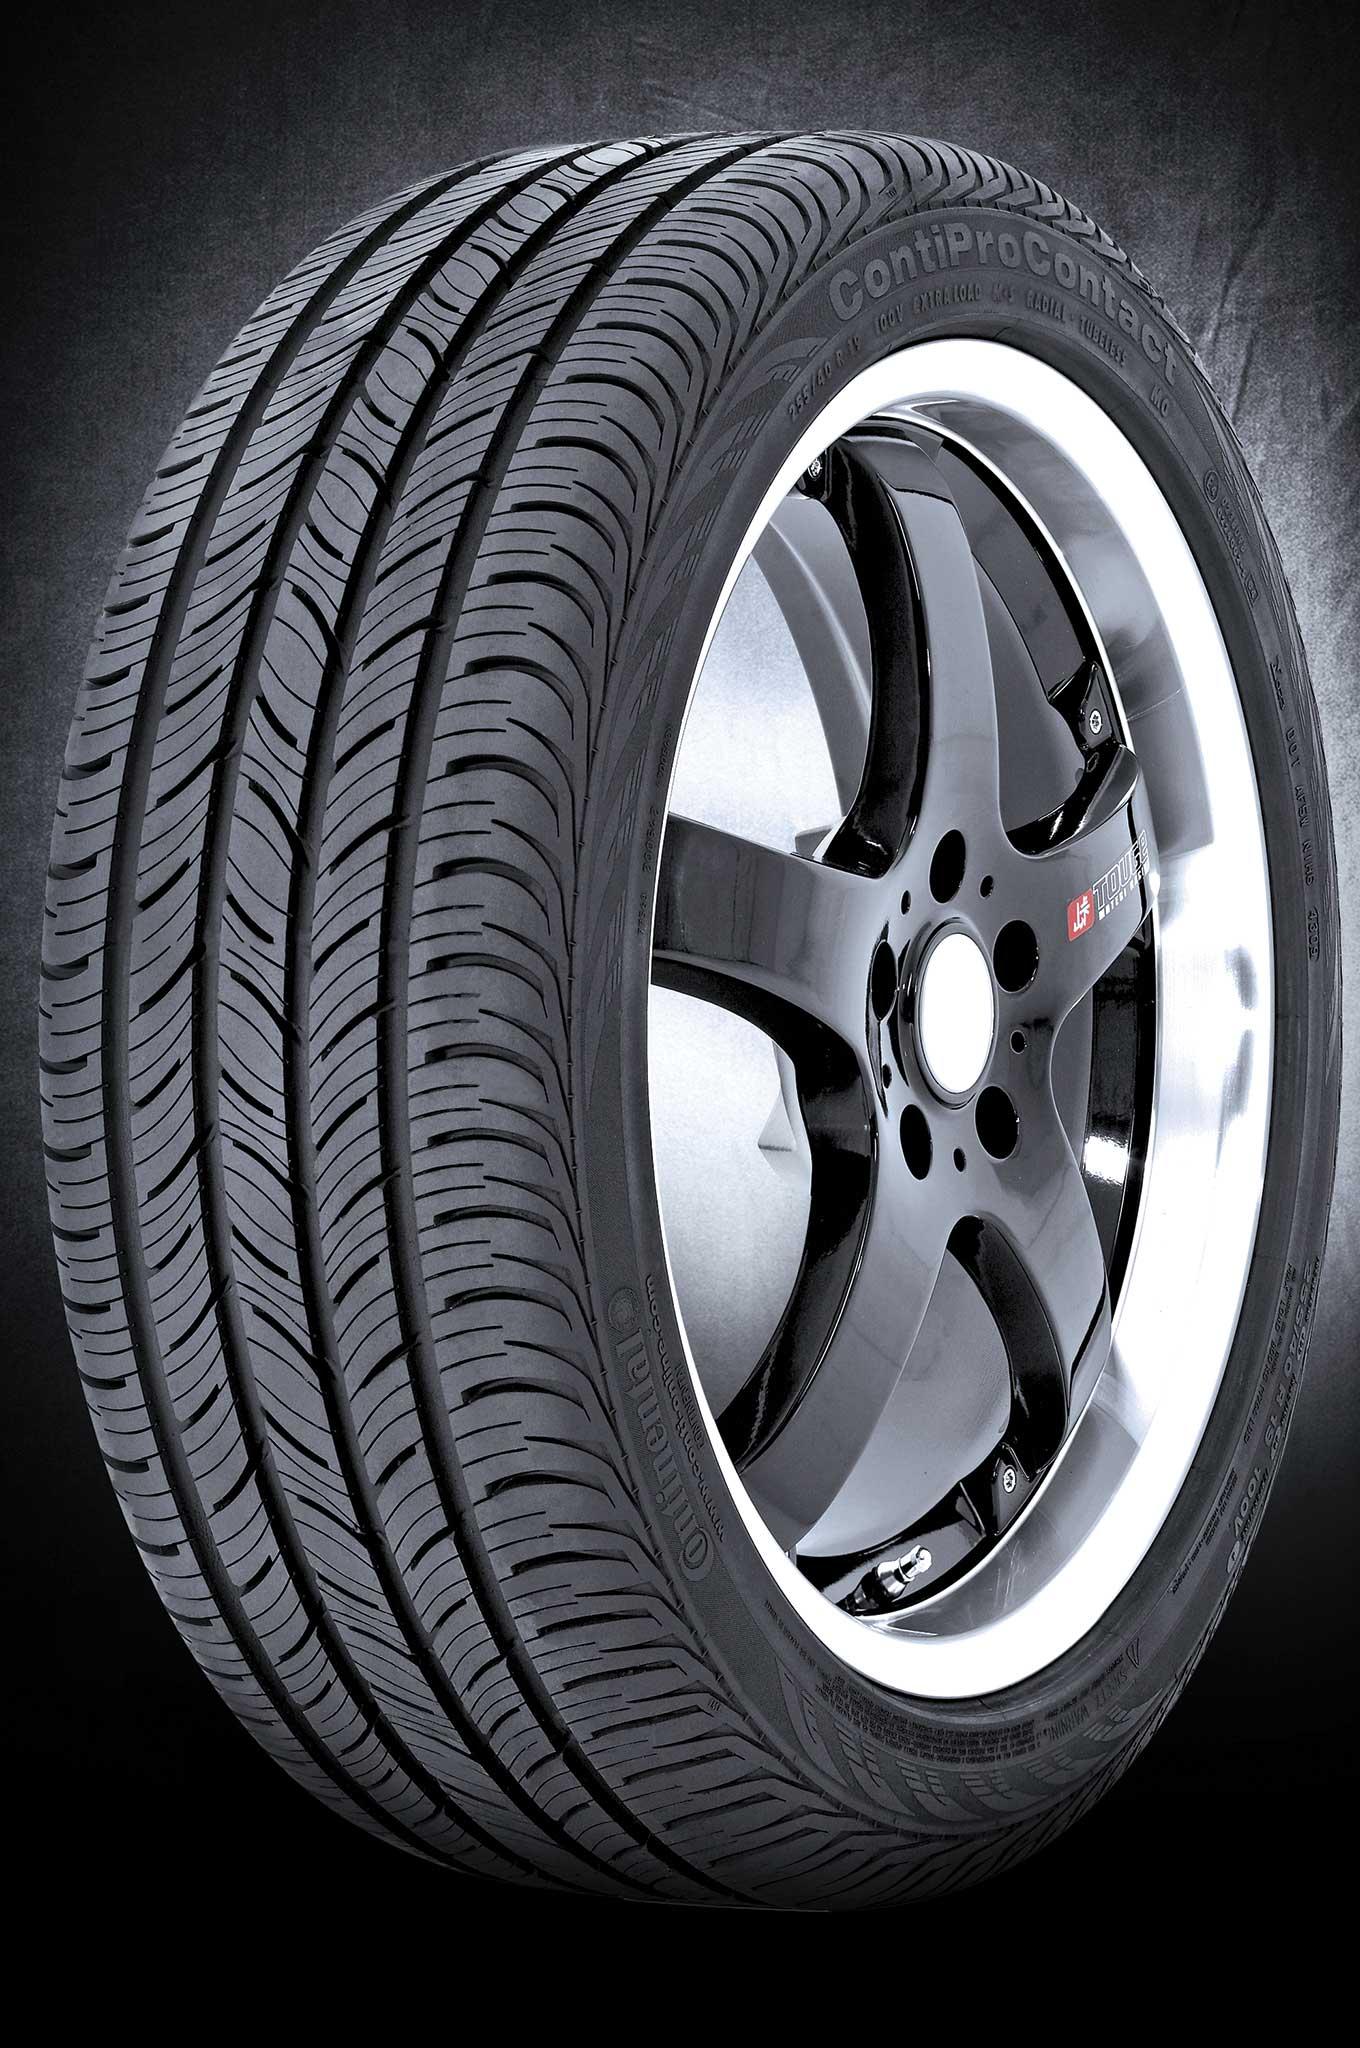 continental tires premium passenger tires contipro contact 003